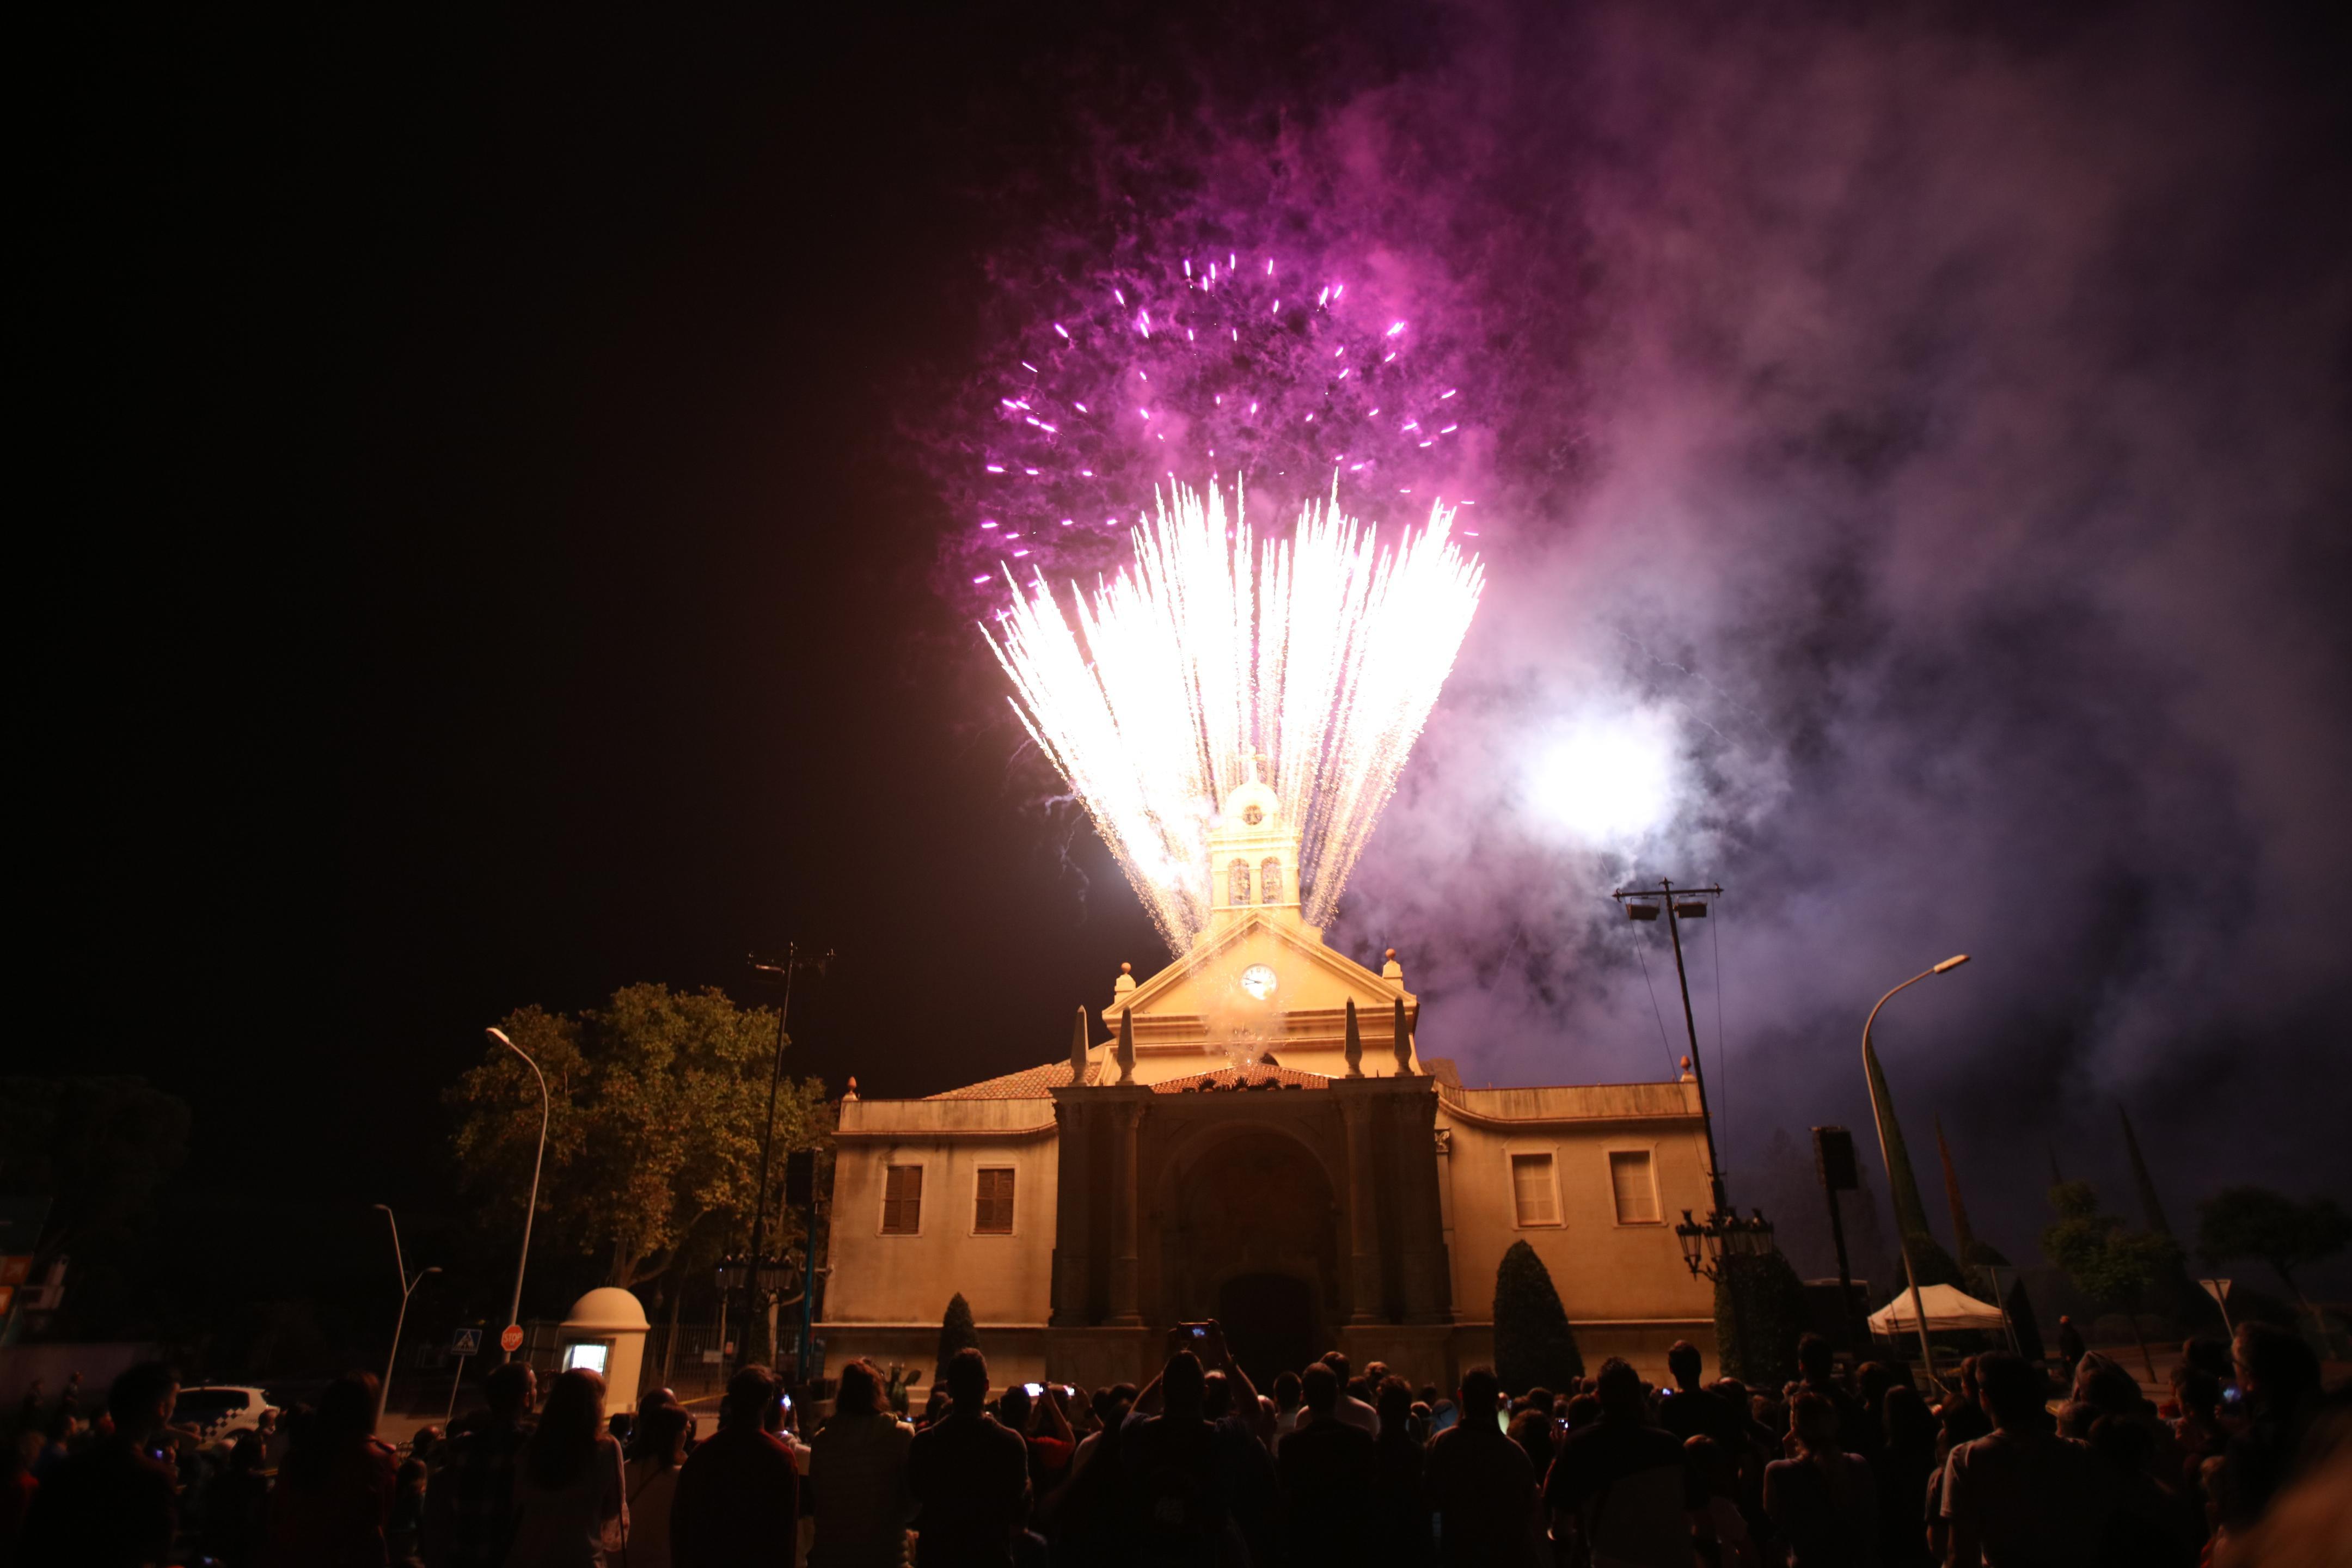 MISERICÒRDIA 2018 - Carretillada de Misericòrdia, encesa de la façana i mostra piromusical